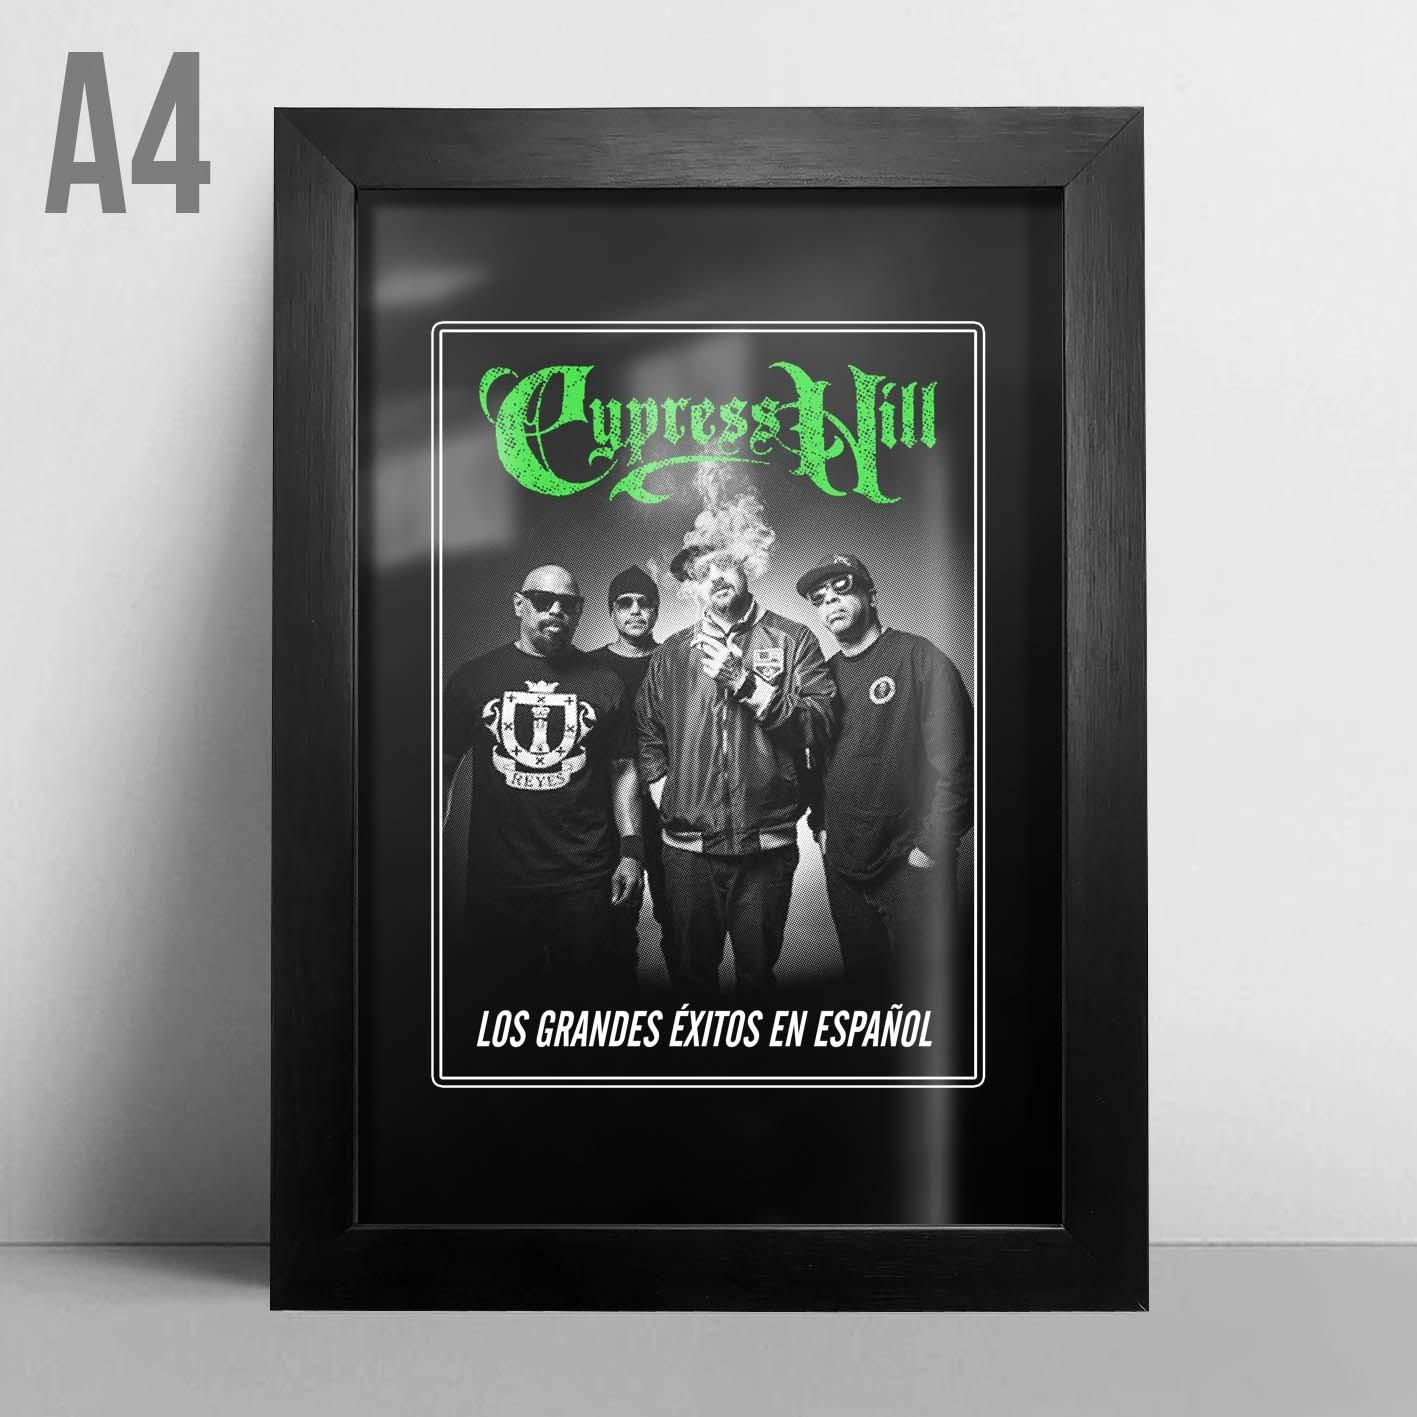 Quadro A4 - Cypress Hill